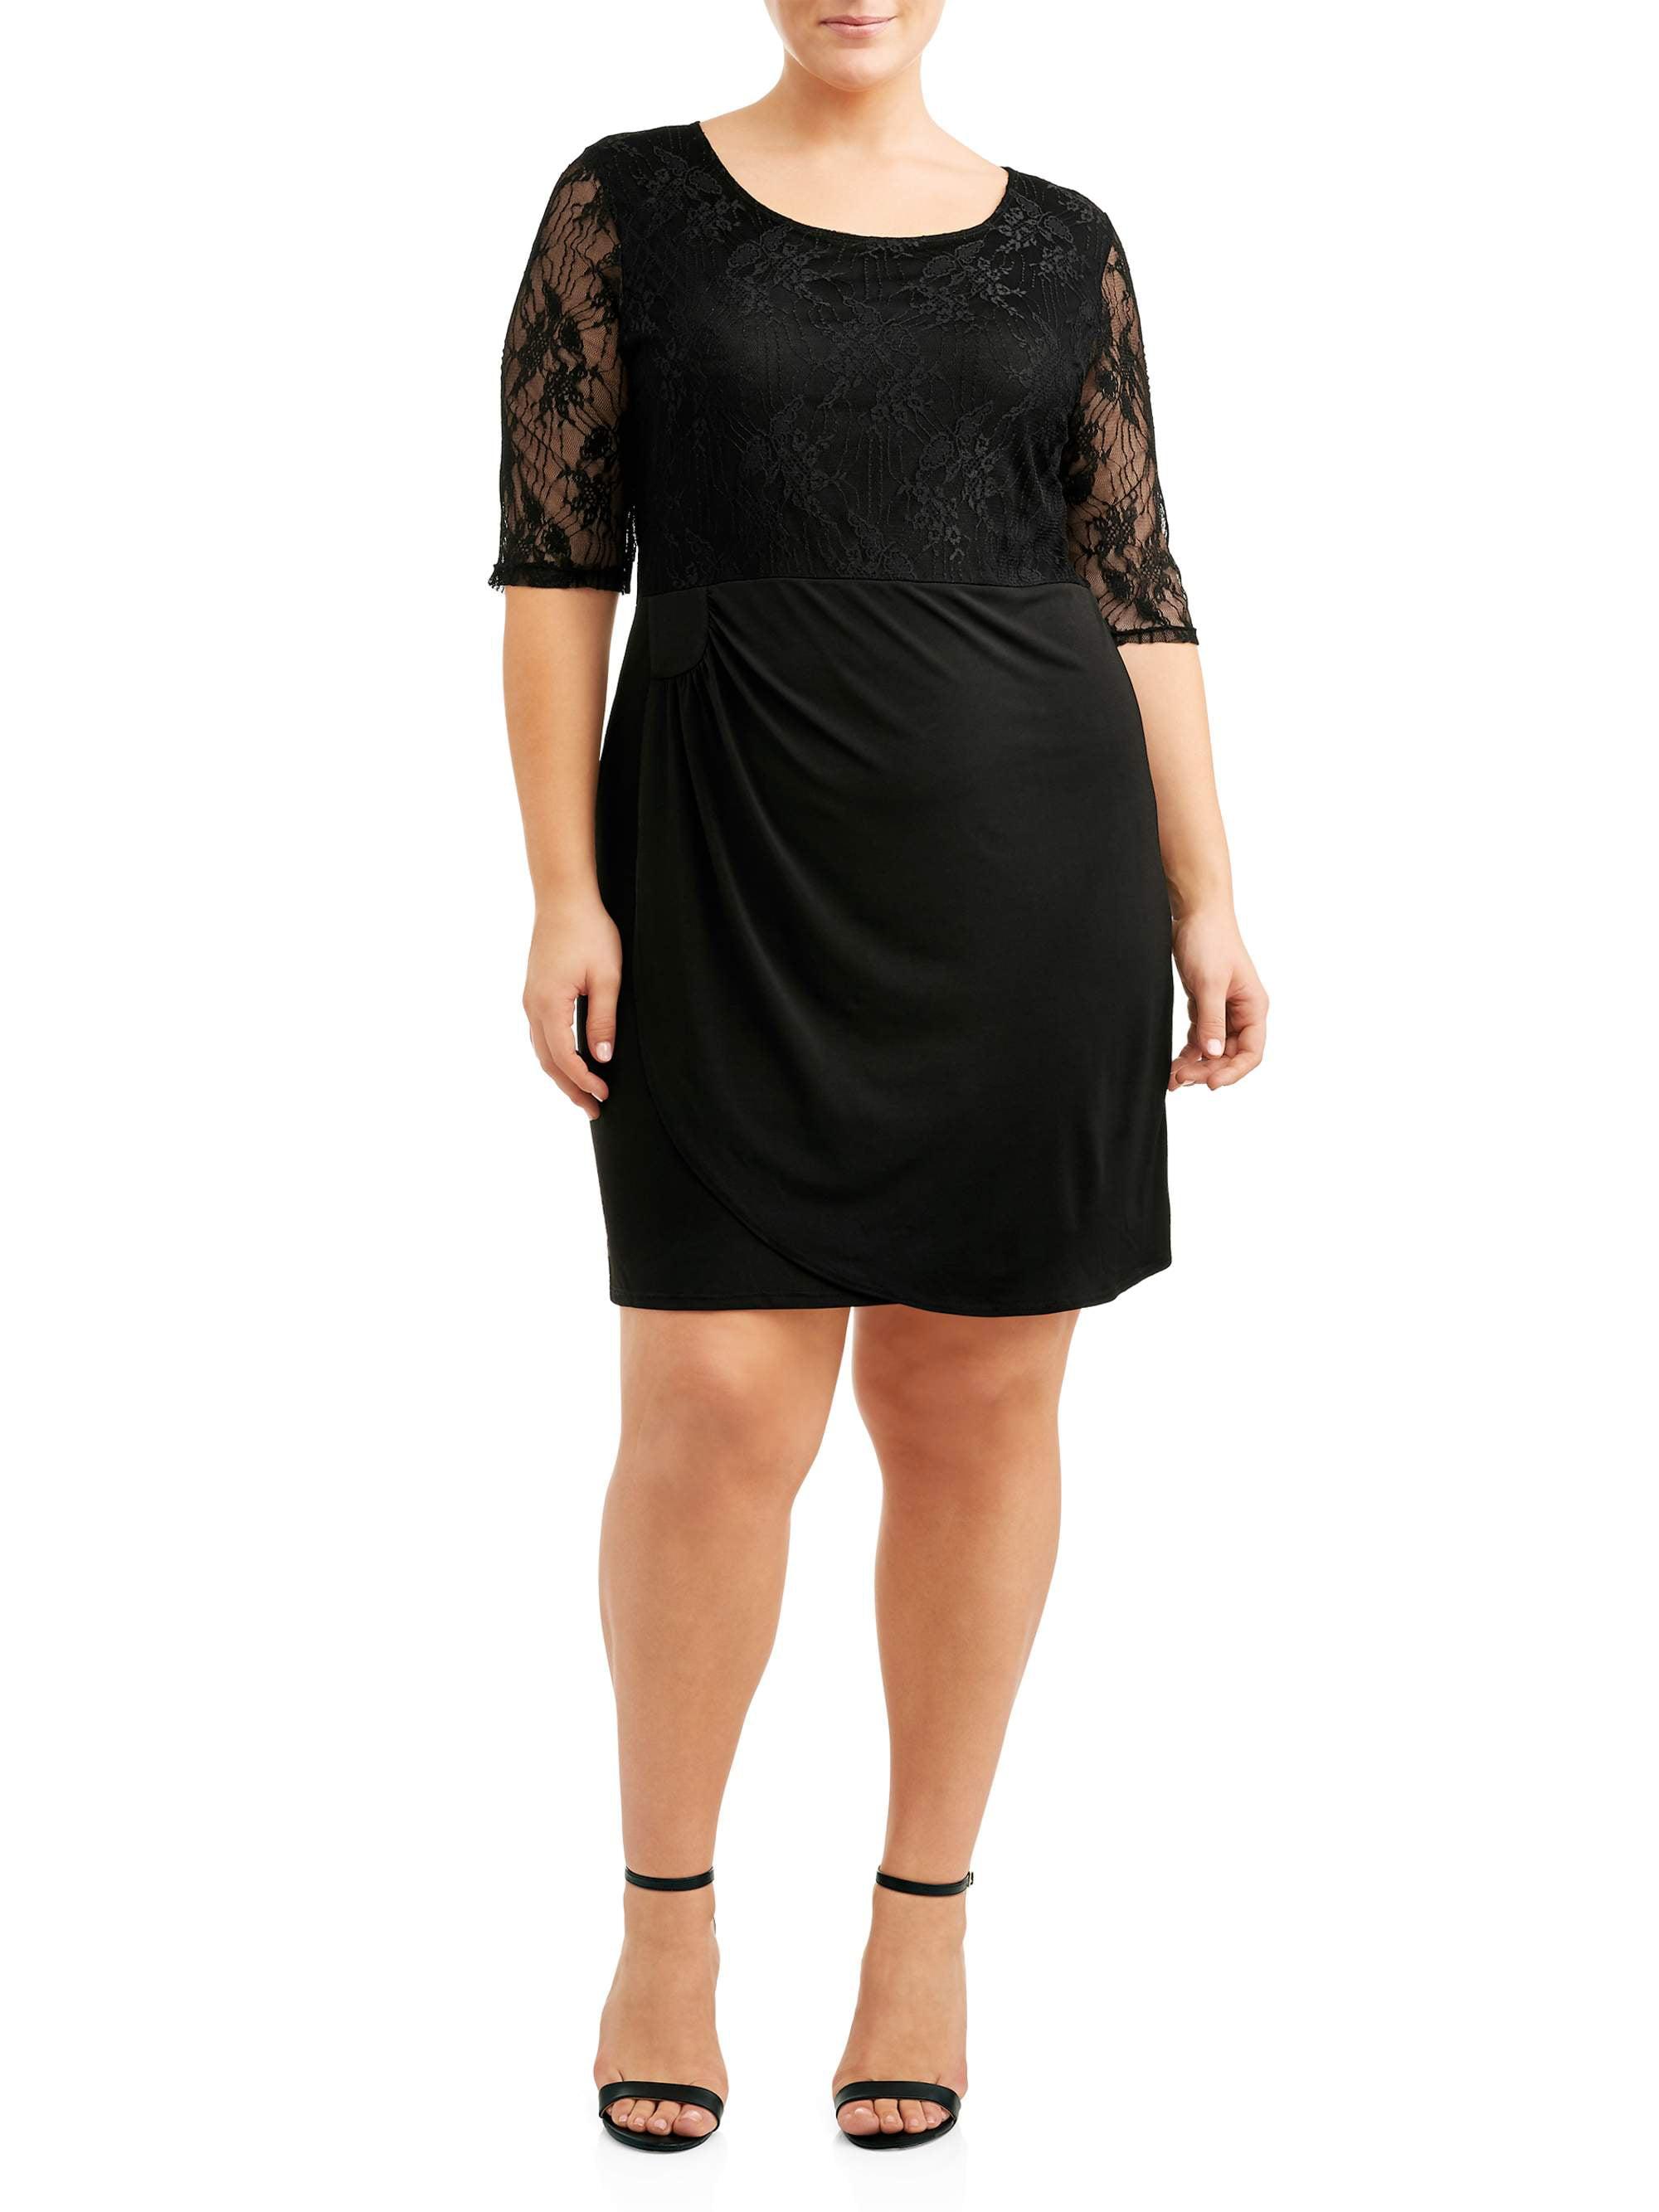 Women's Plus Size Elbow Sleeve Surplice Lace Bust Dress